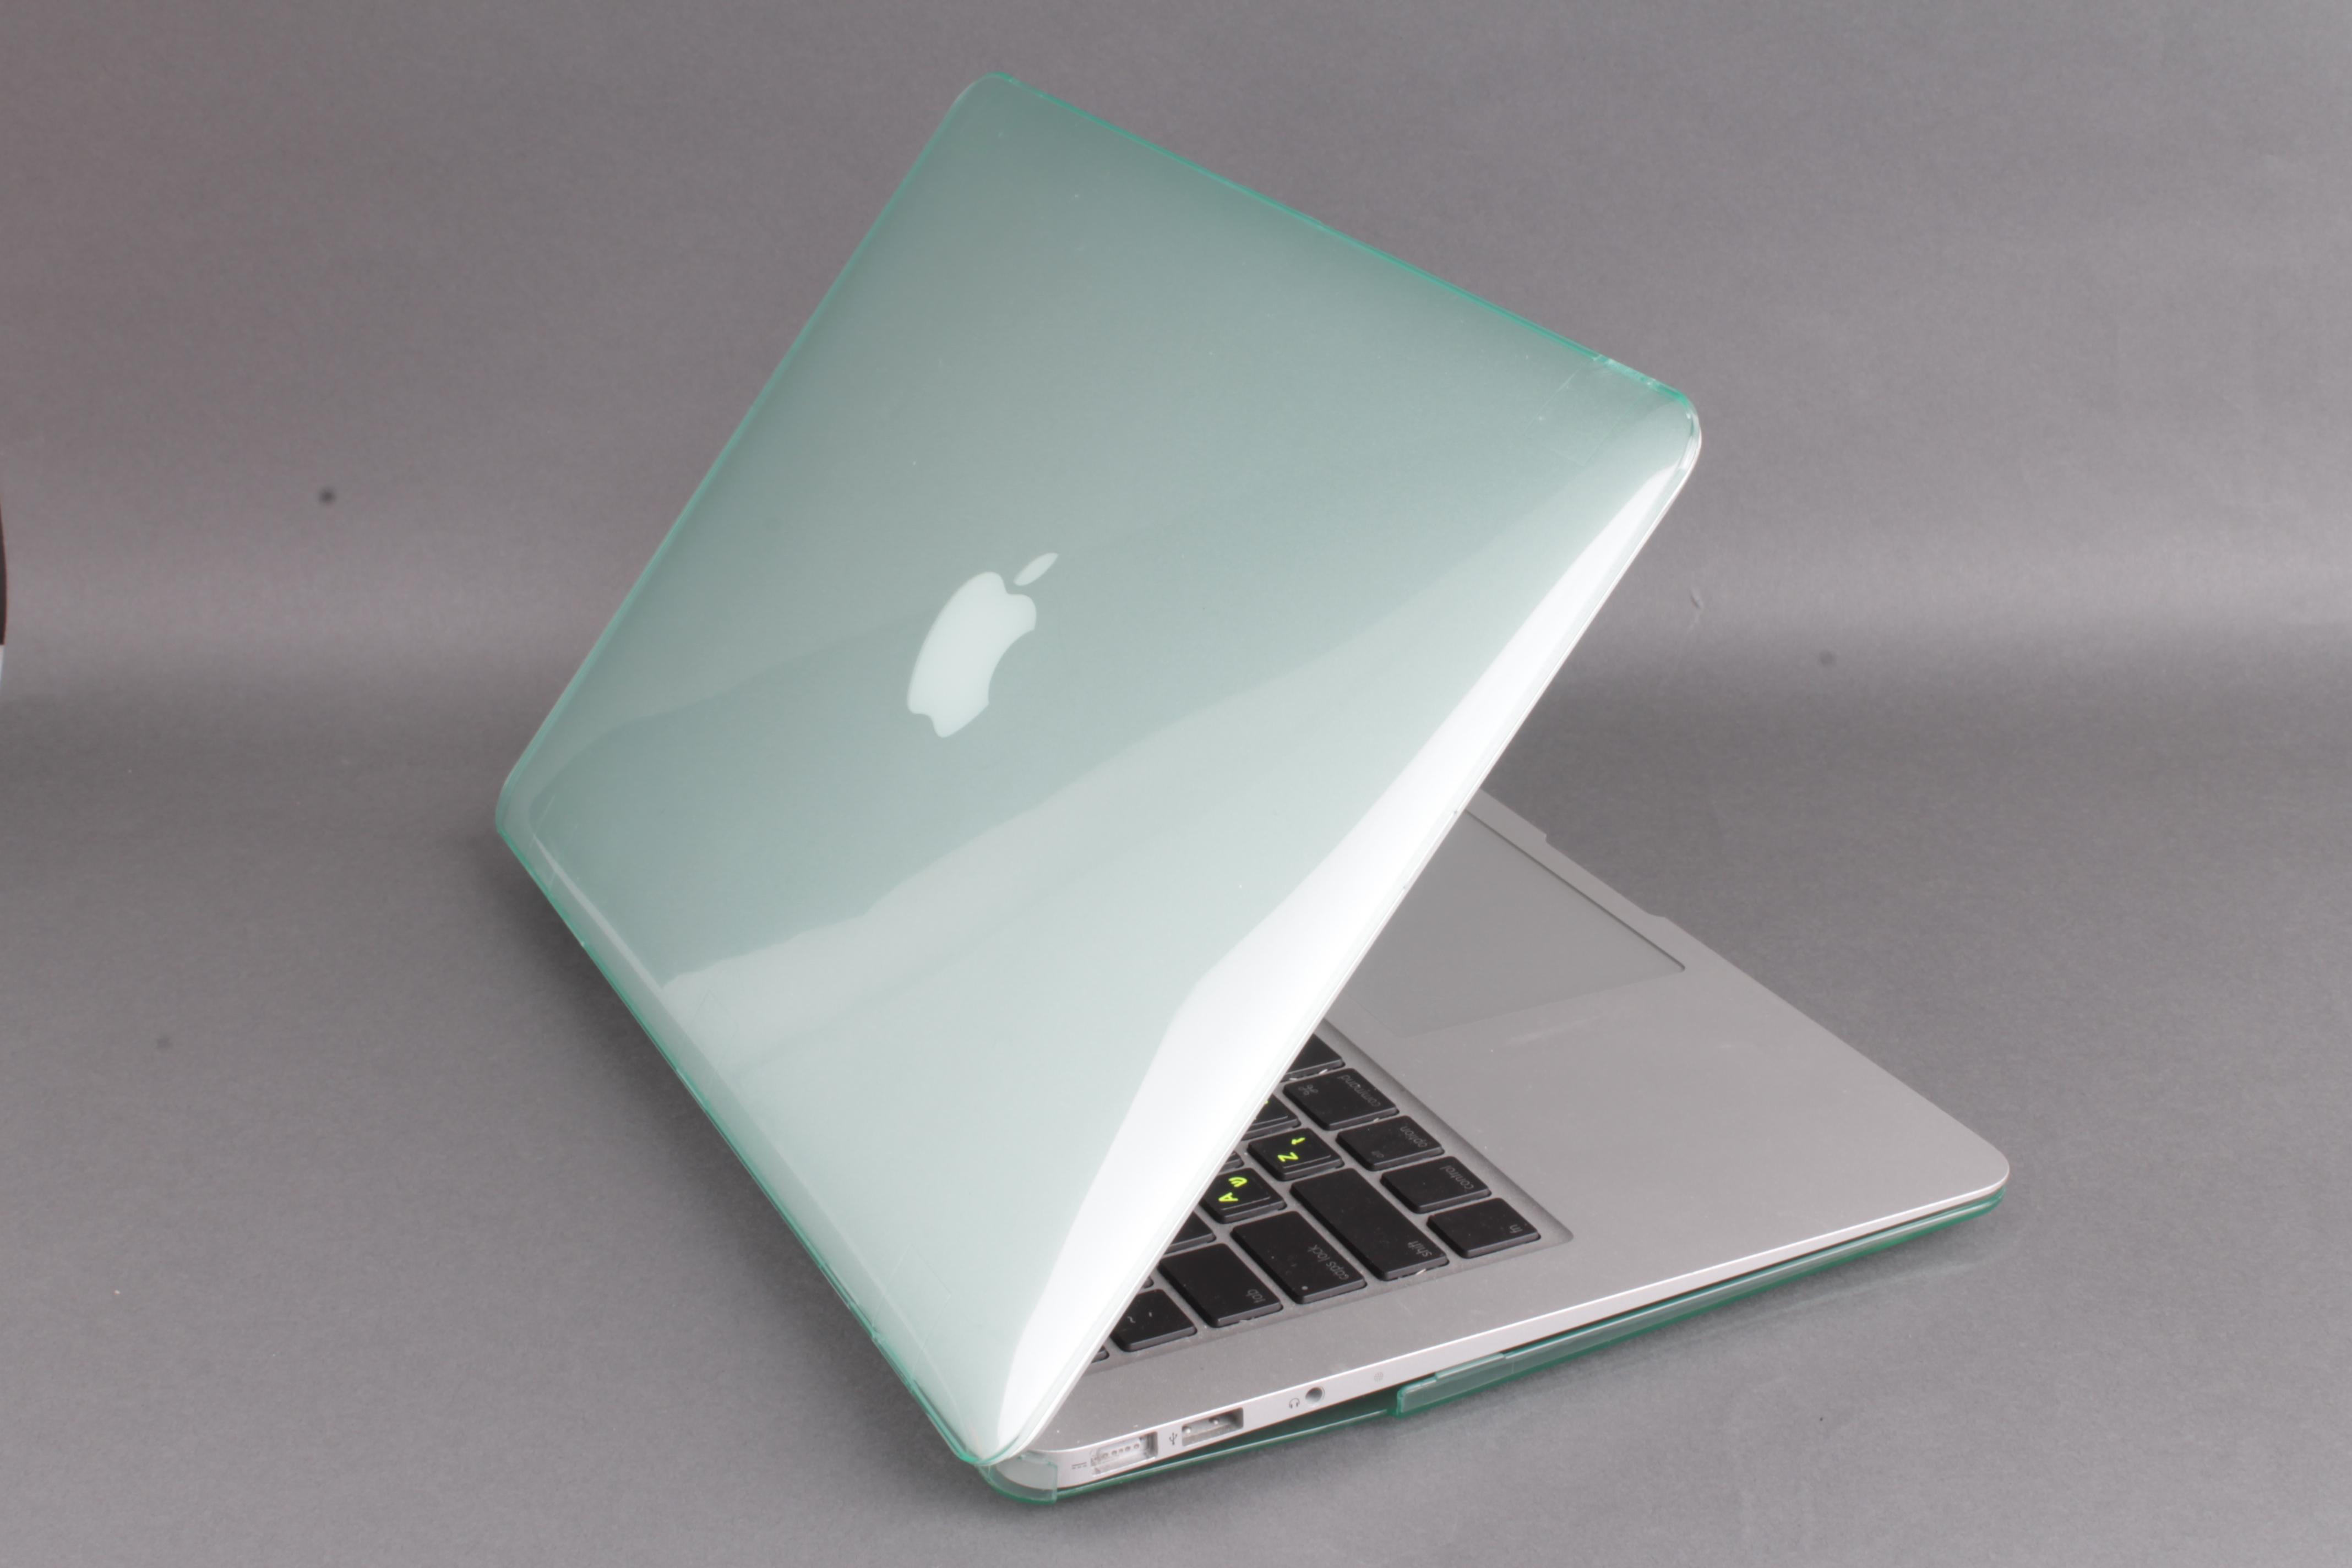 tasche schutzh lle cover hard case hartschale h lle f r apple macbook air 13 ebay. Black Bedroom Furniture Sets. Home Design Ideas